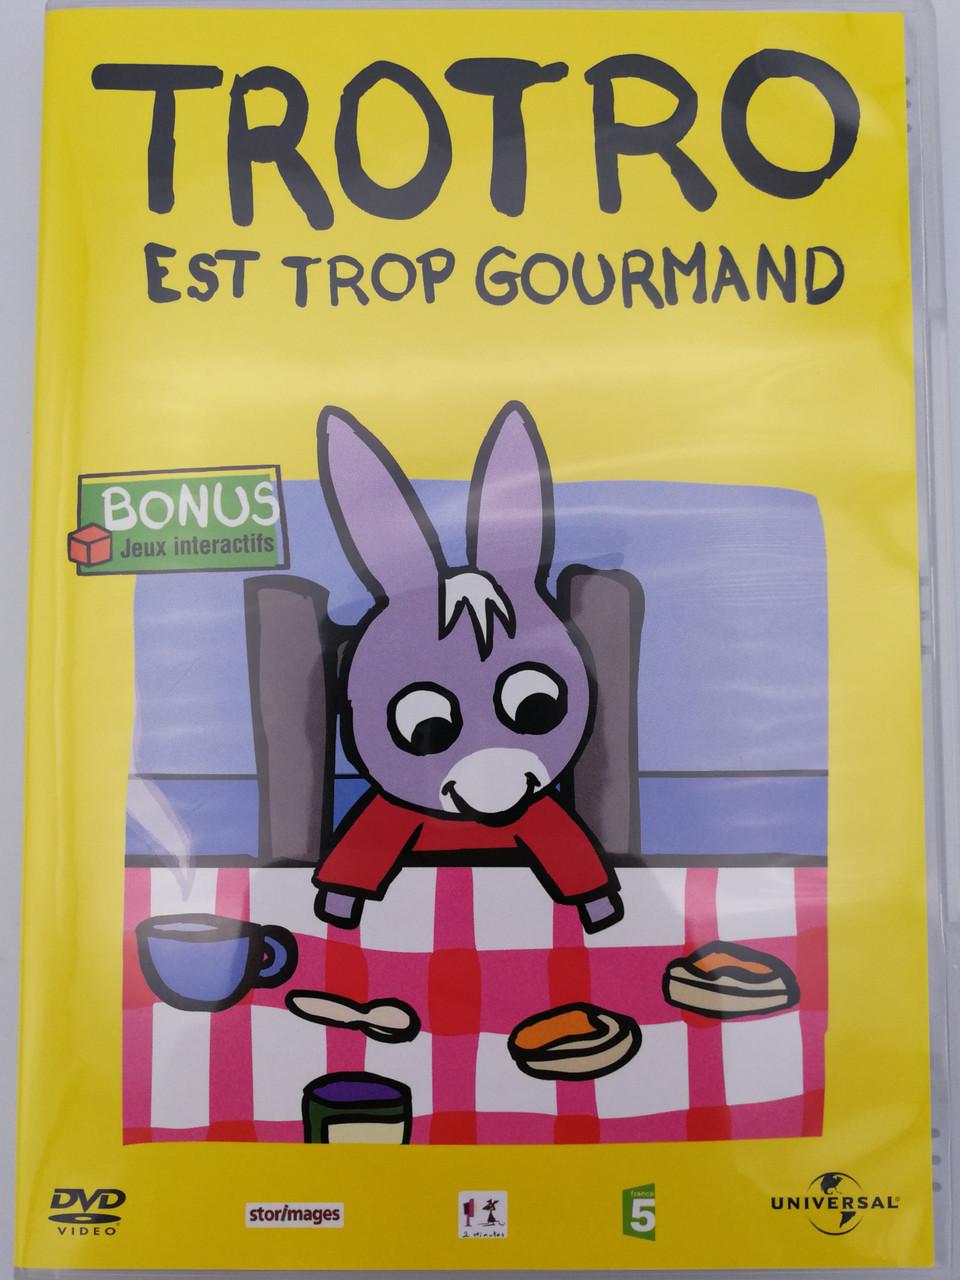 Trotro est trop gourmand DVD 2004 / Bonus: Interacive Games - Jeux Interactifs / Directed by ...